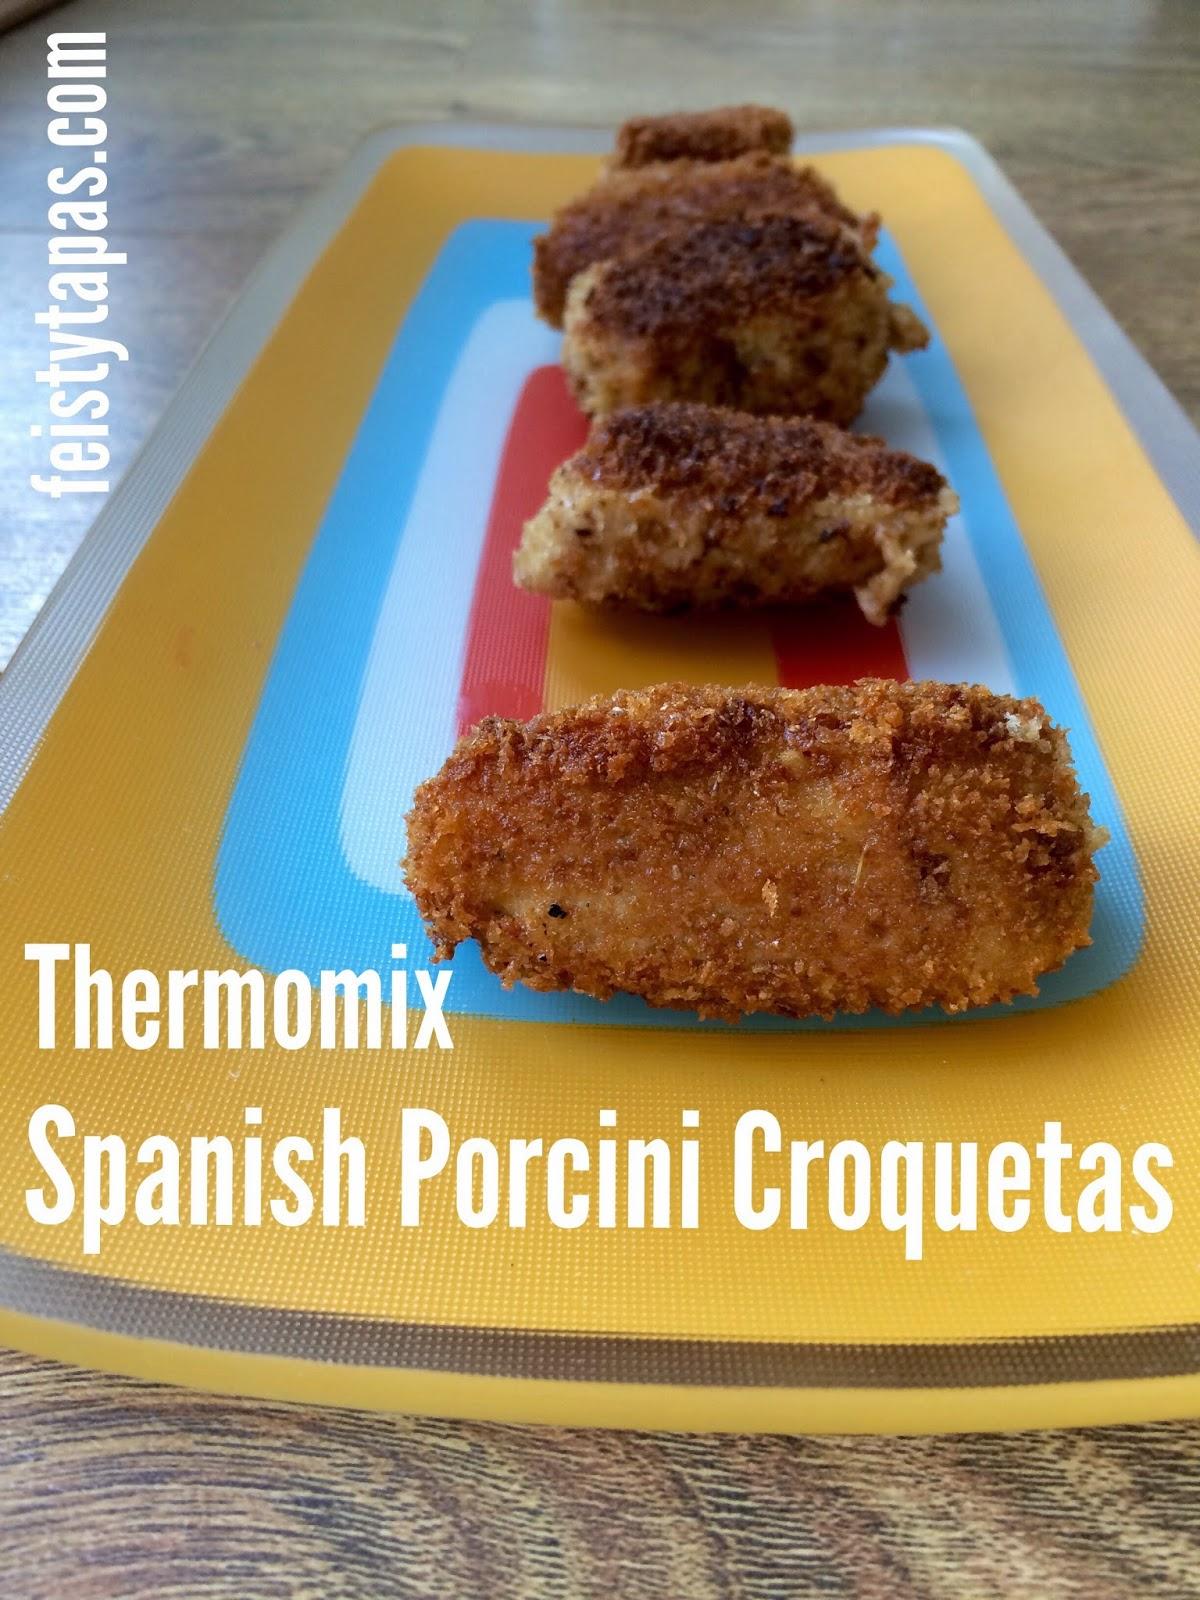 Thermomix Porcini croquetas